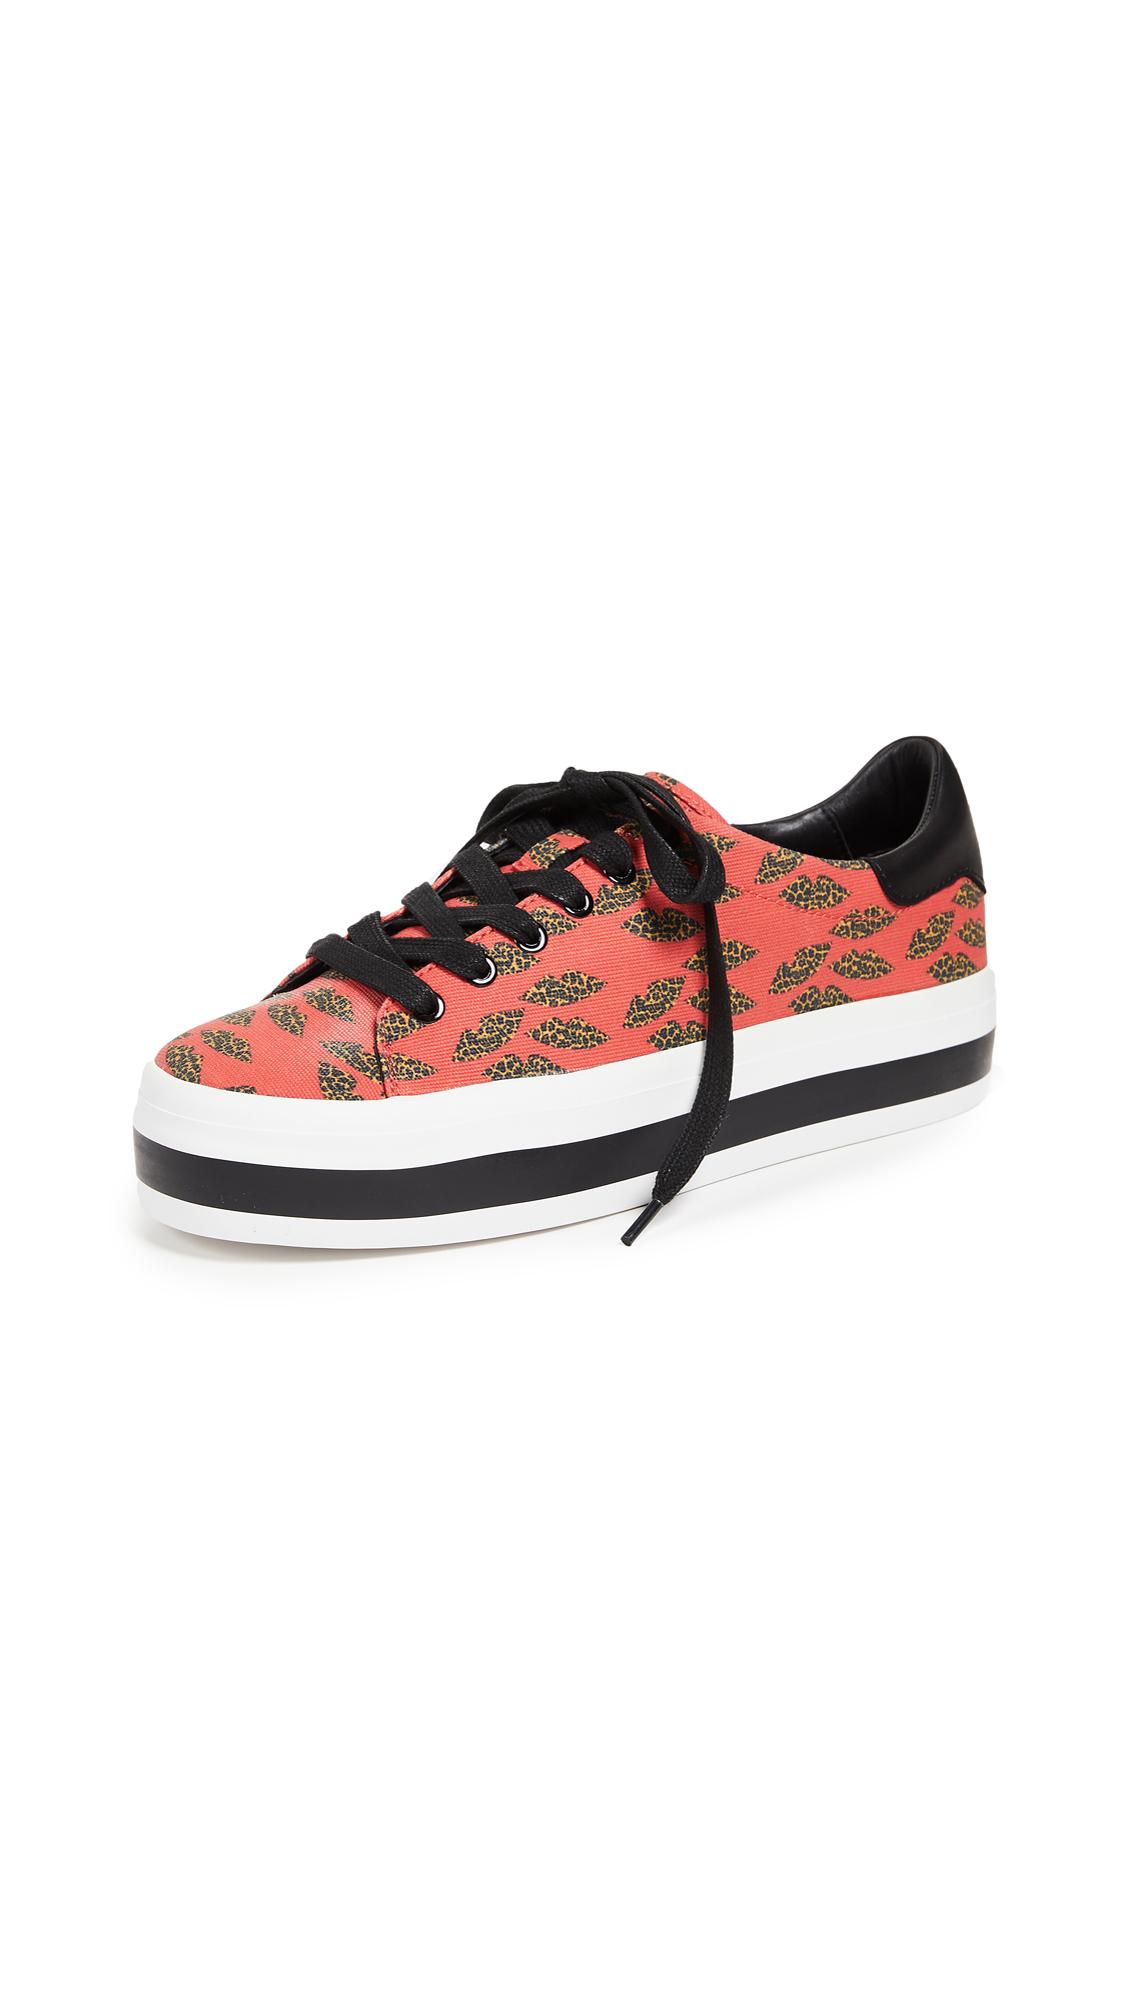 alice + olivia x Donald Robertson Ezra Cheetah Sneakers - Cheetah